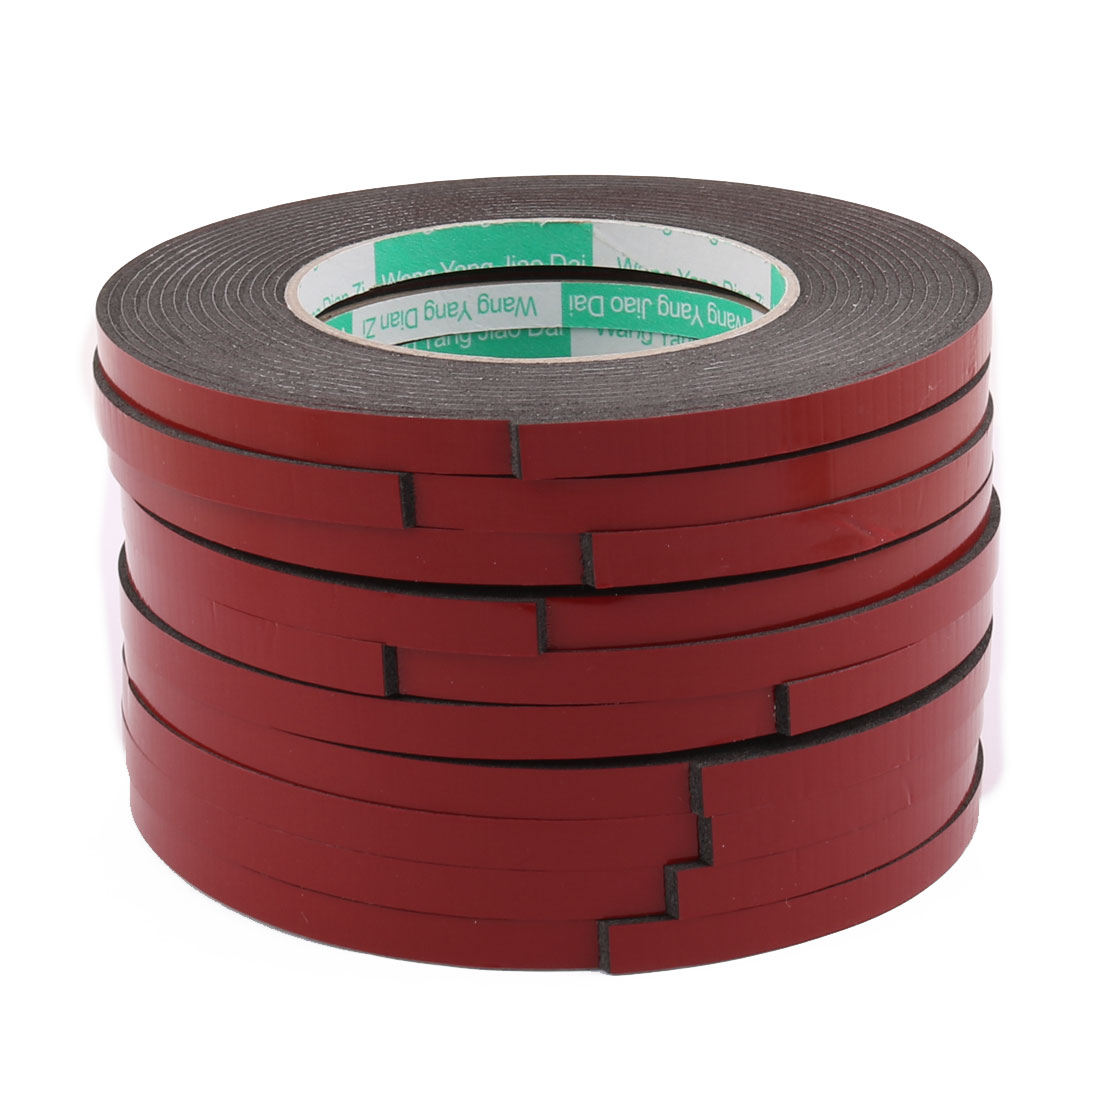 10pcs 8mmx2mm Red Double Sided Sponge Tape Adhesive Sticker Foam Glue Strip 5M